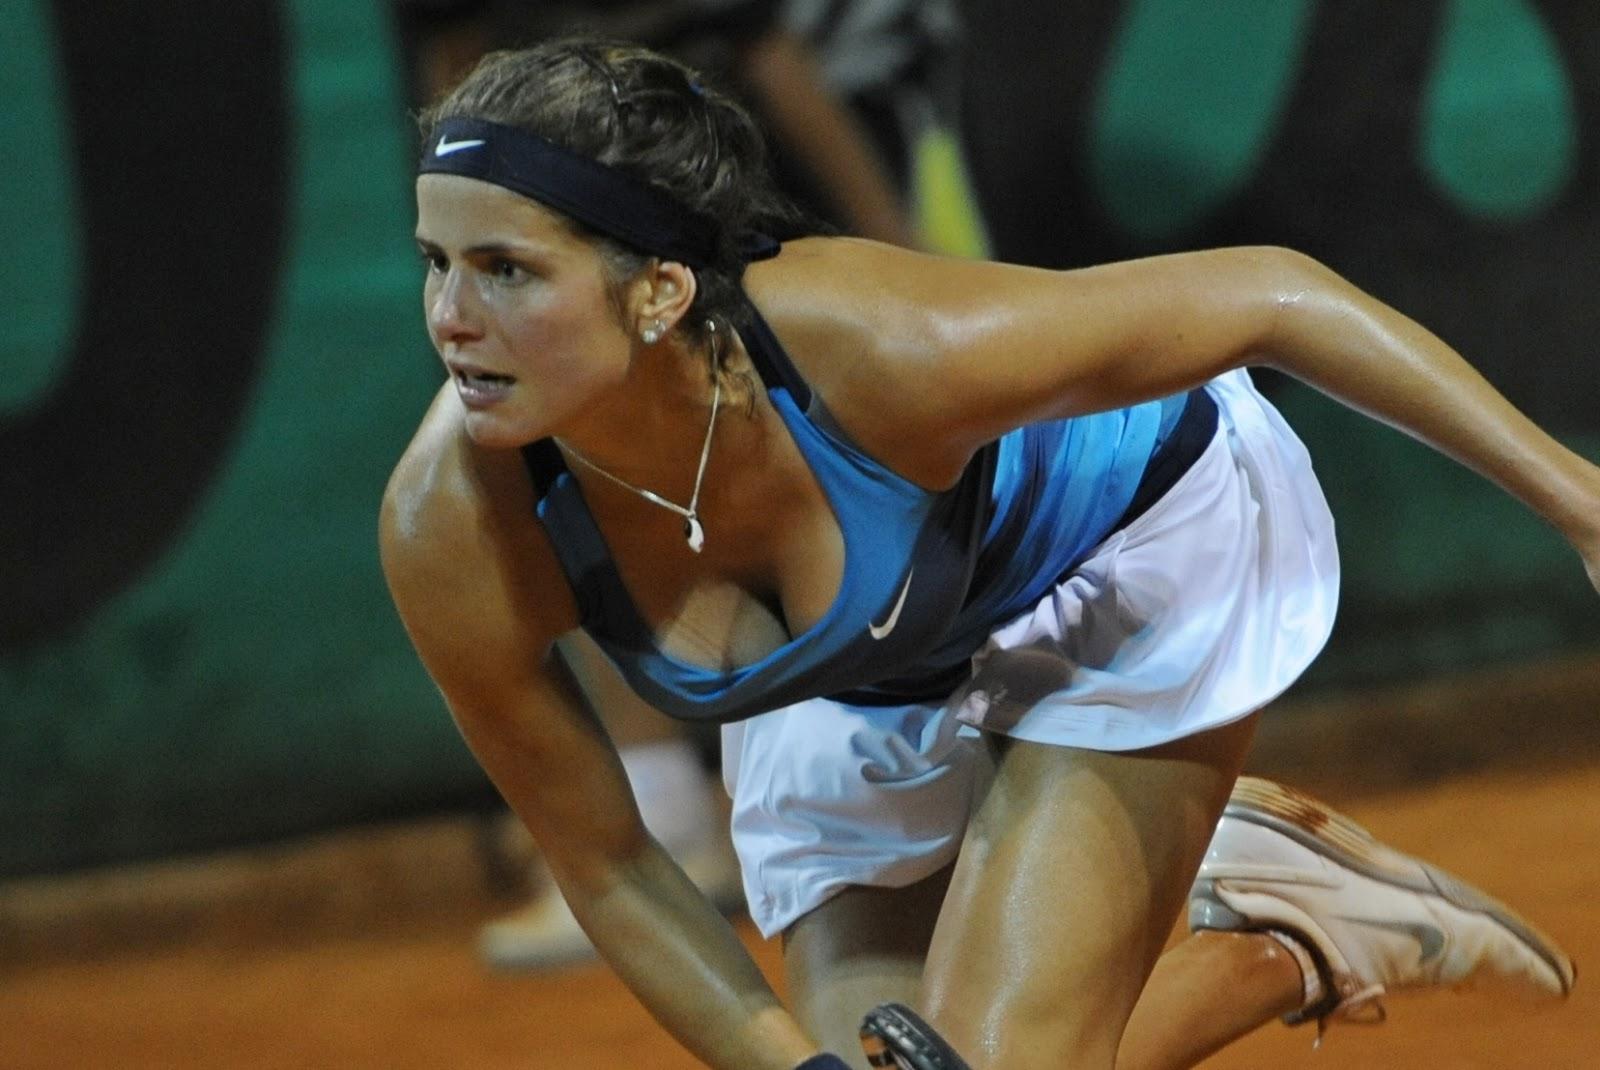 Tennis Central Wta Julia Goerges - Allemagne-1495